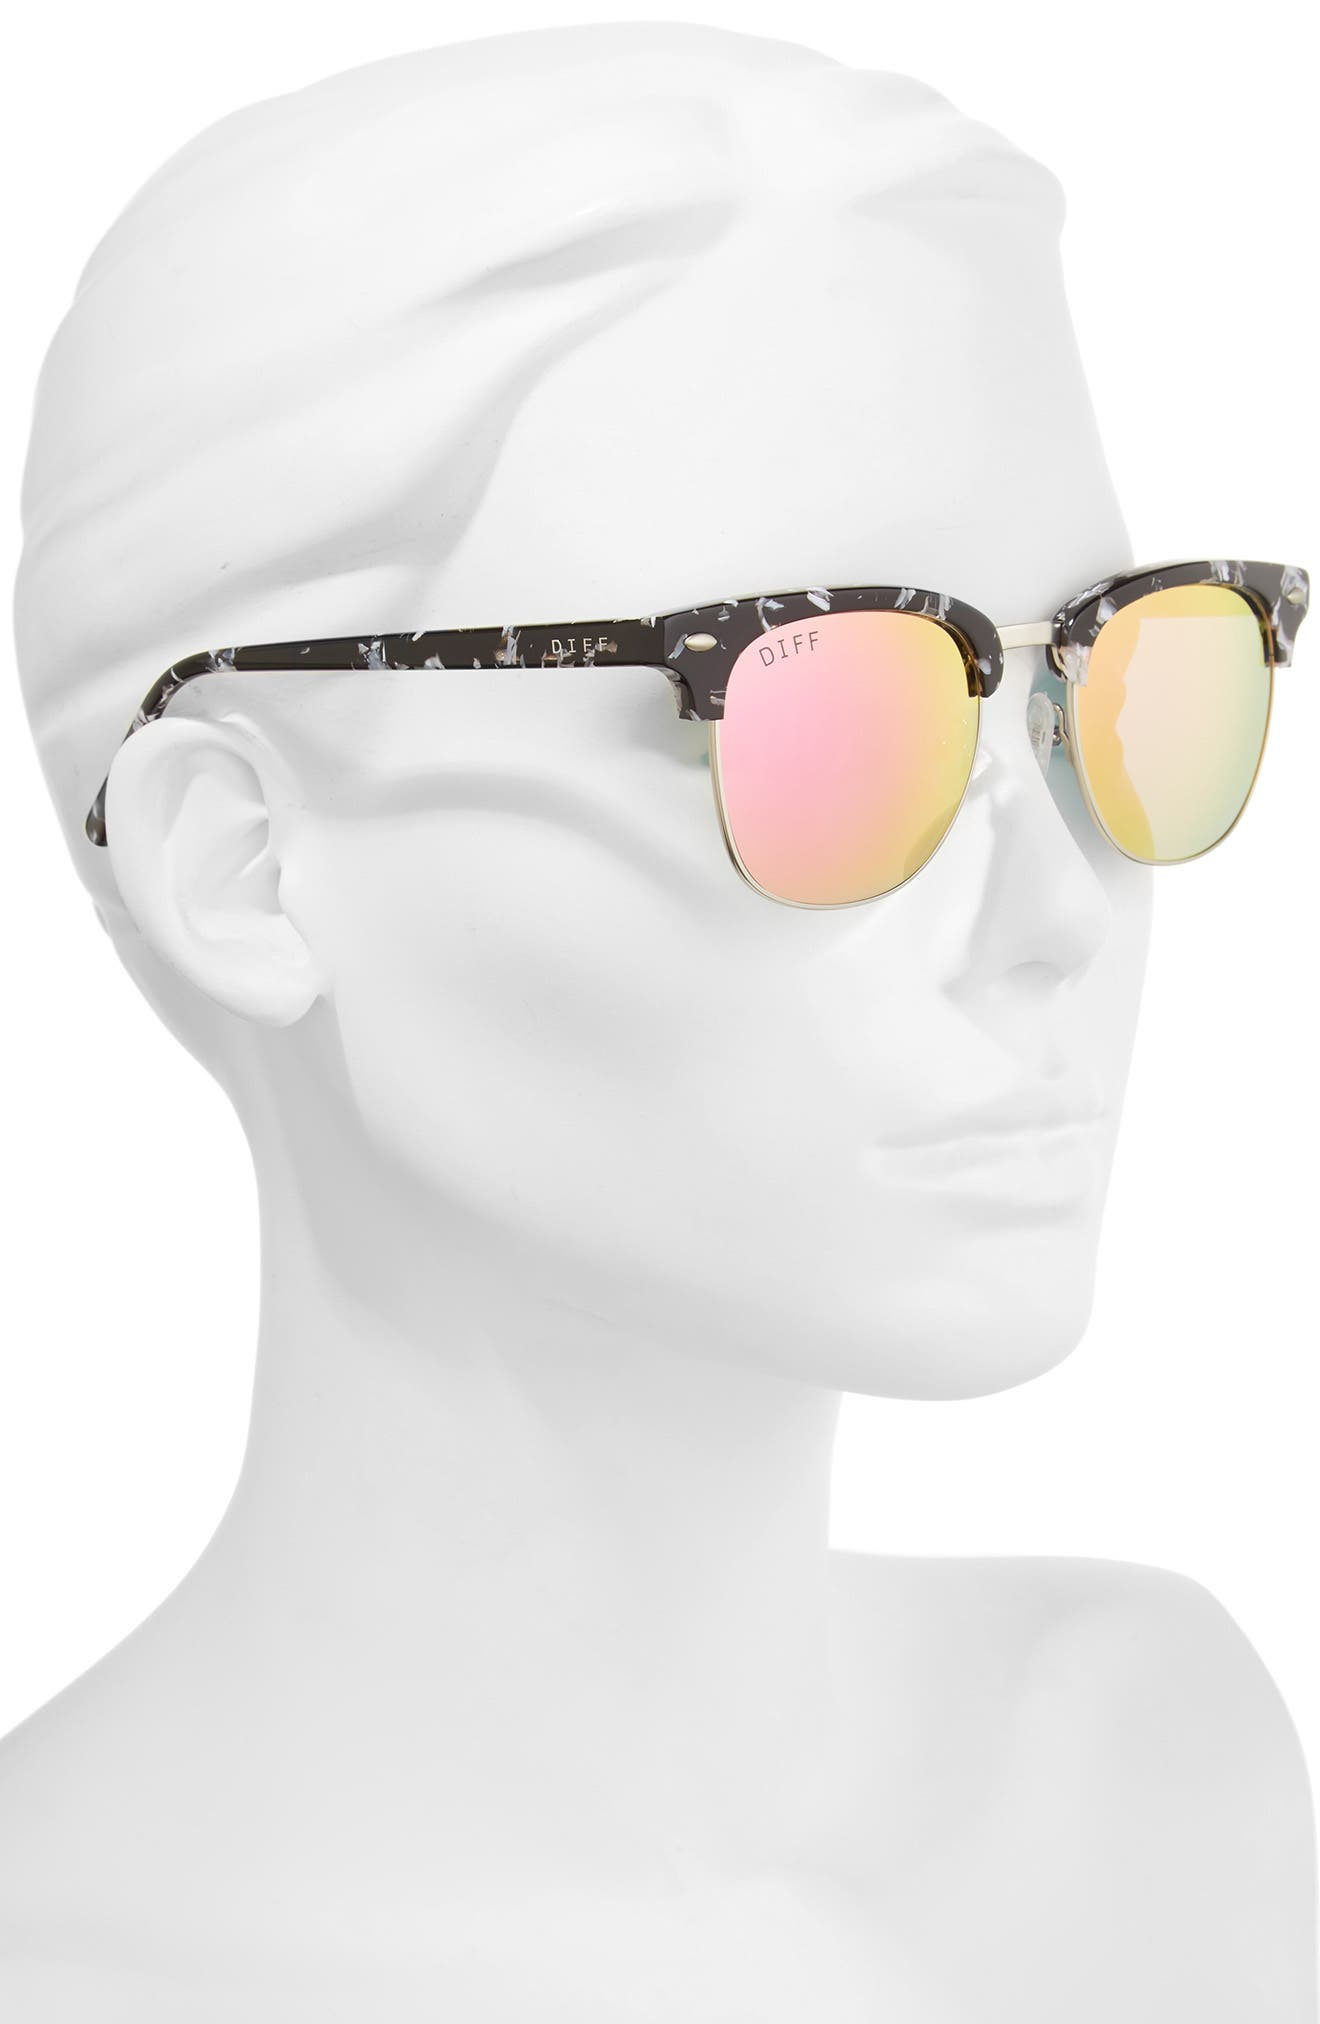 Barry 51mm Polarized Retro Sunglasses,                             Alternate thumbnail 10, color,